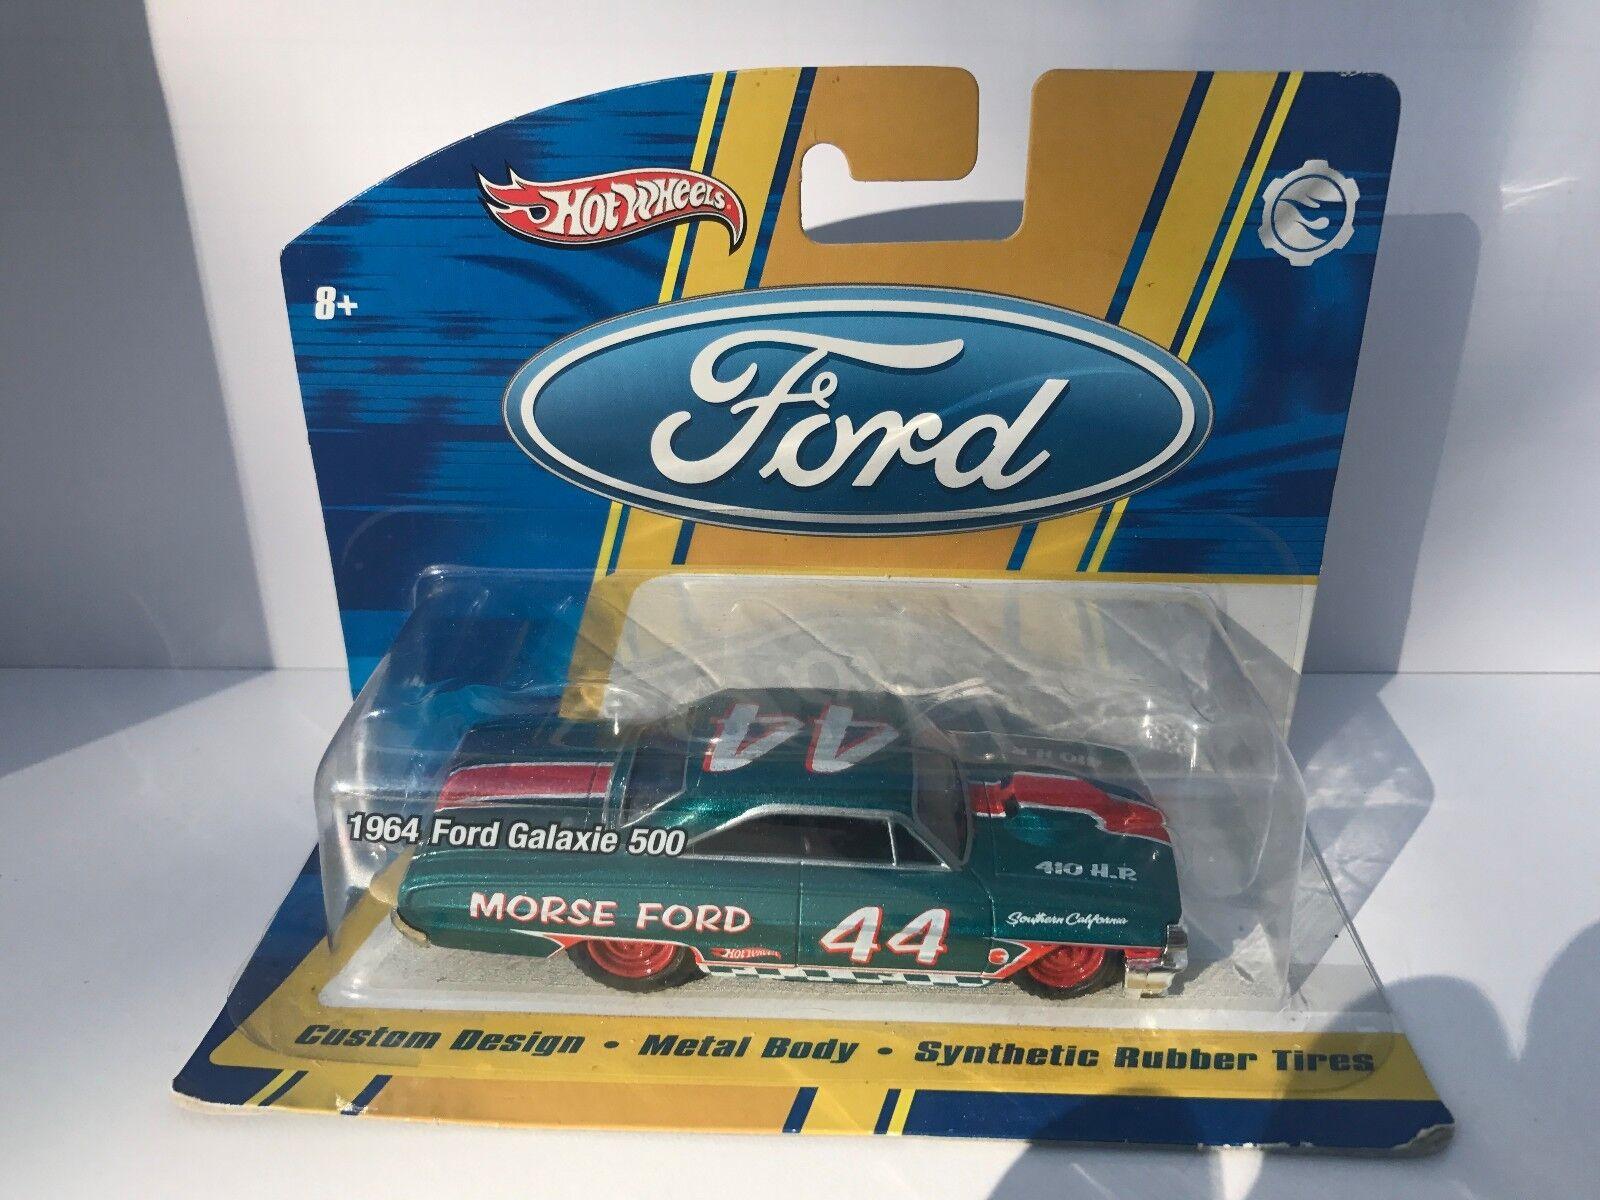 heta hjul 1  43 skala Morse Ford 1964 Ford Galaxy 500 VHTF